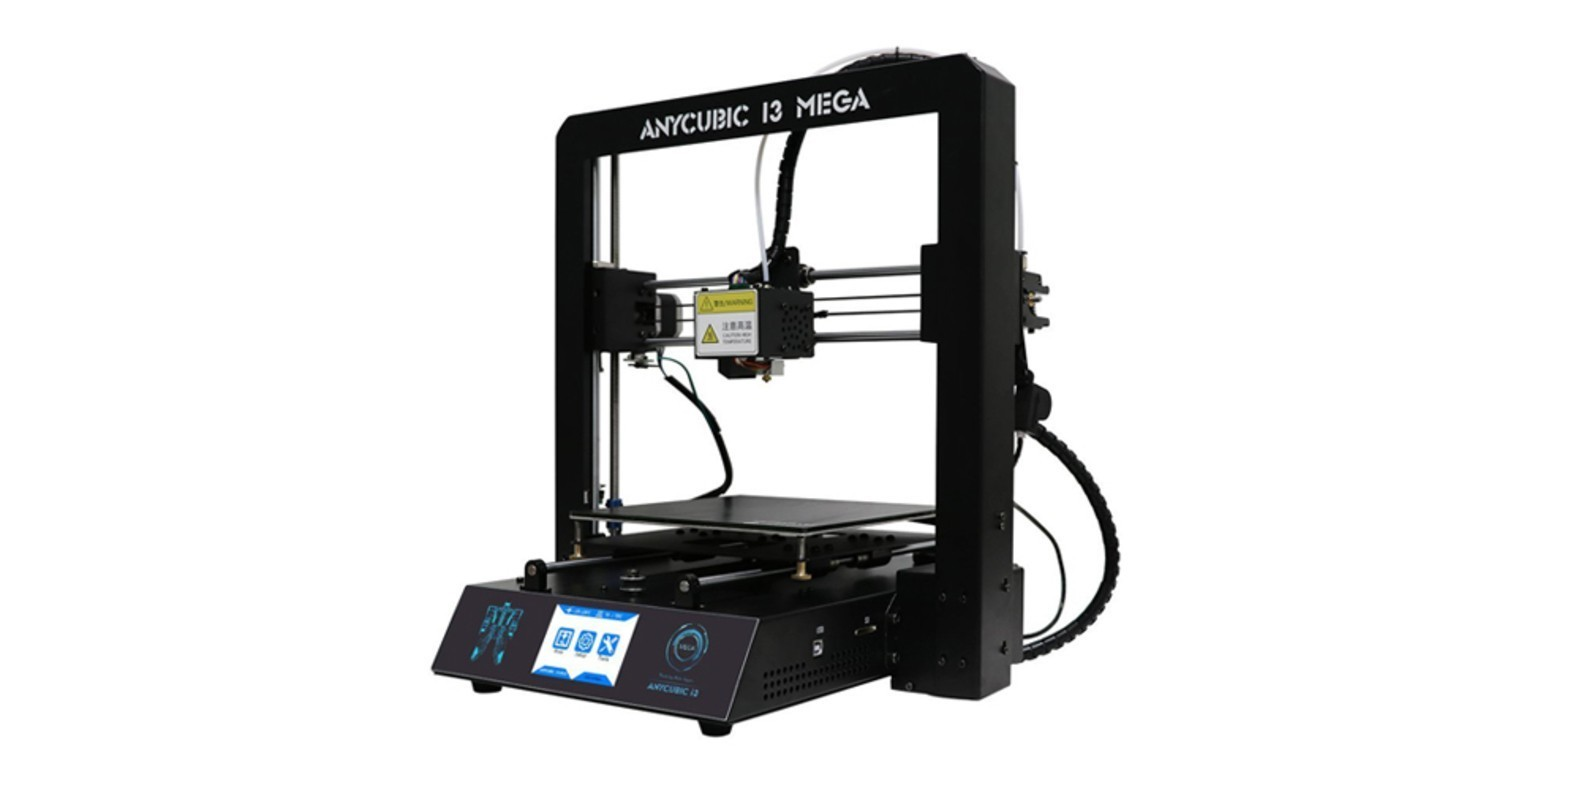 Anycubic i3 MEGA Imprimante 3D